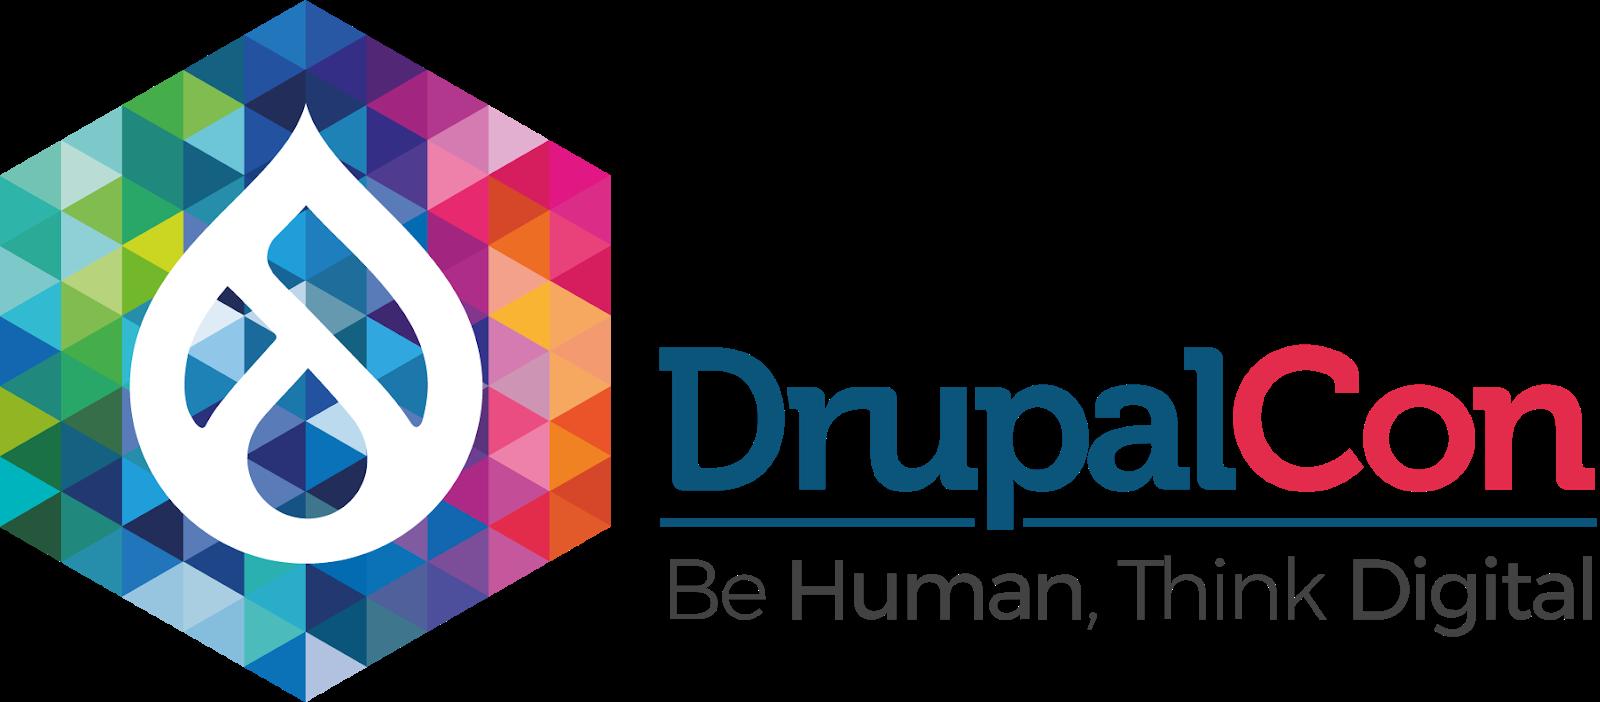 Drupalcon brand lockup